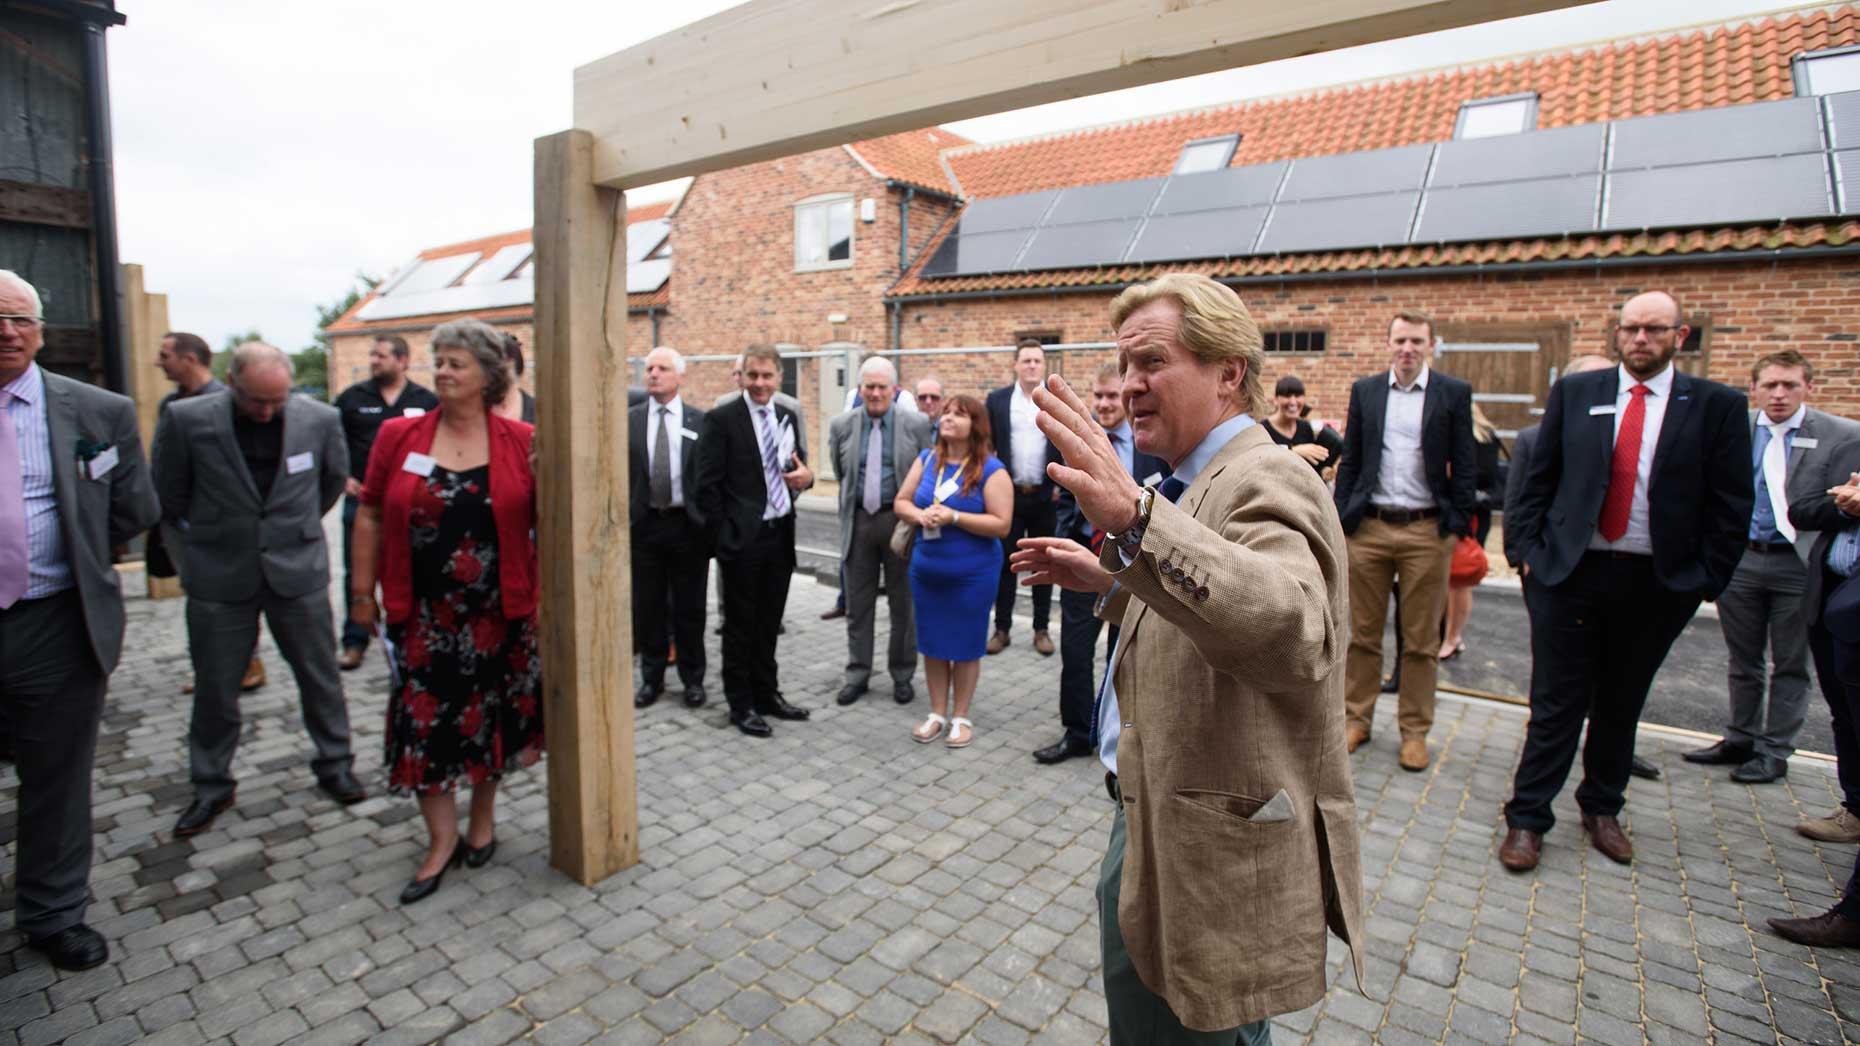 James Birch of Doddington Hall introducing the scheme as building gets underway.